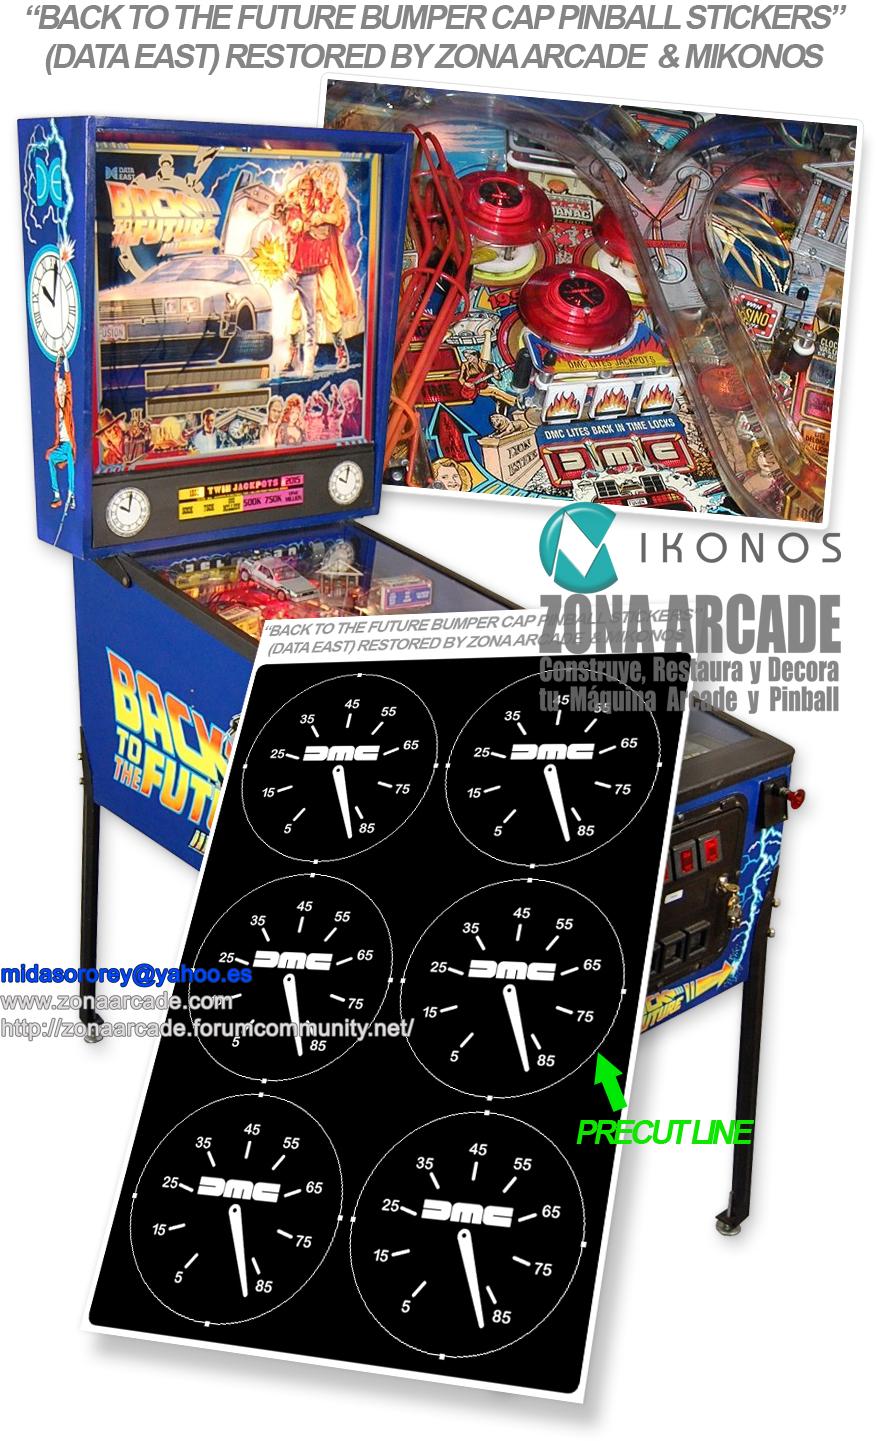 Back-To-the-Future-Bumper-Cap-Pinball-Stickers-Restored-Mikonos1.jpg